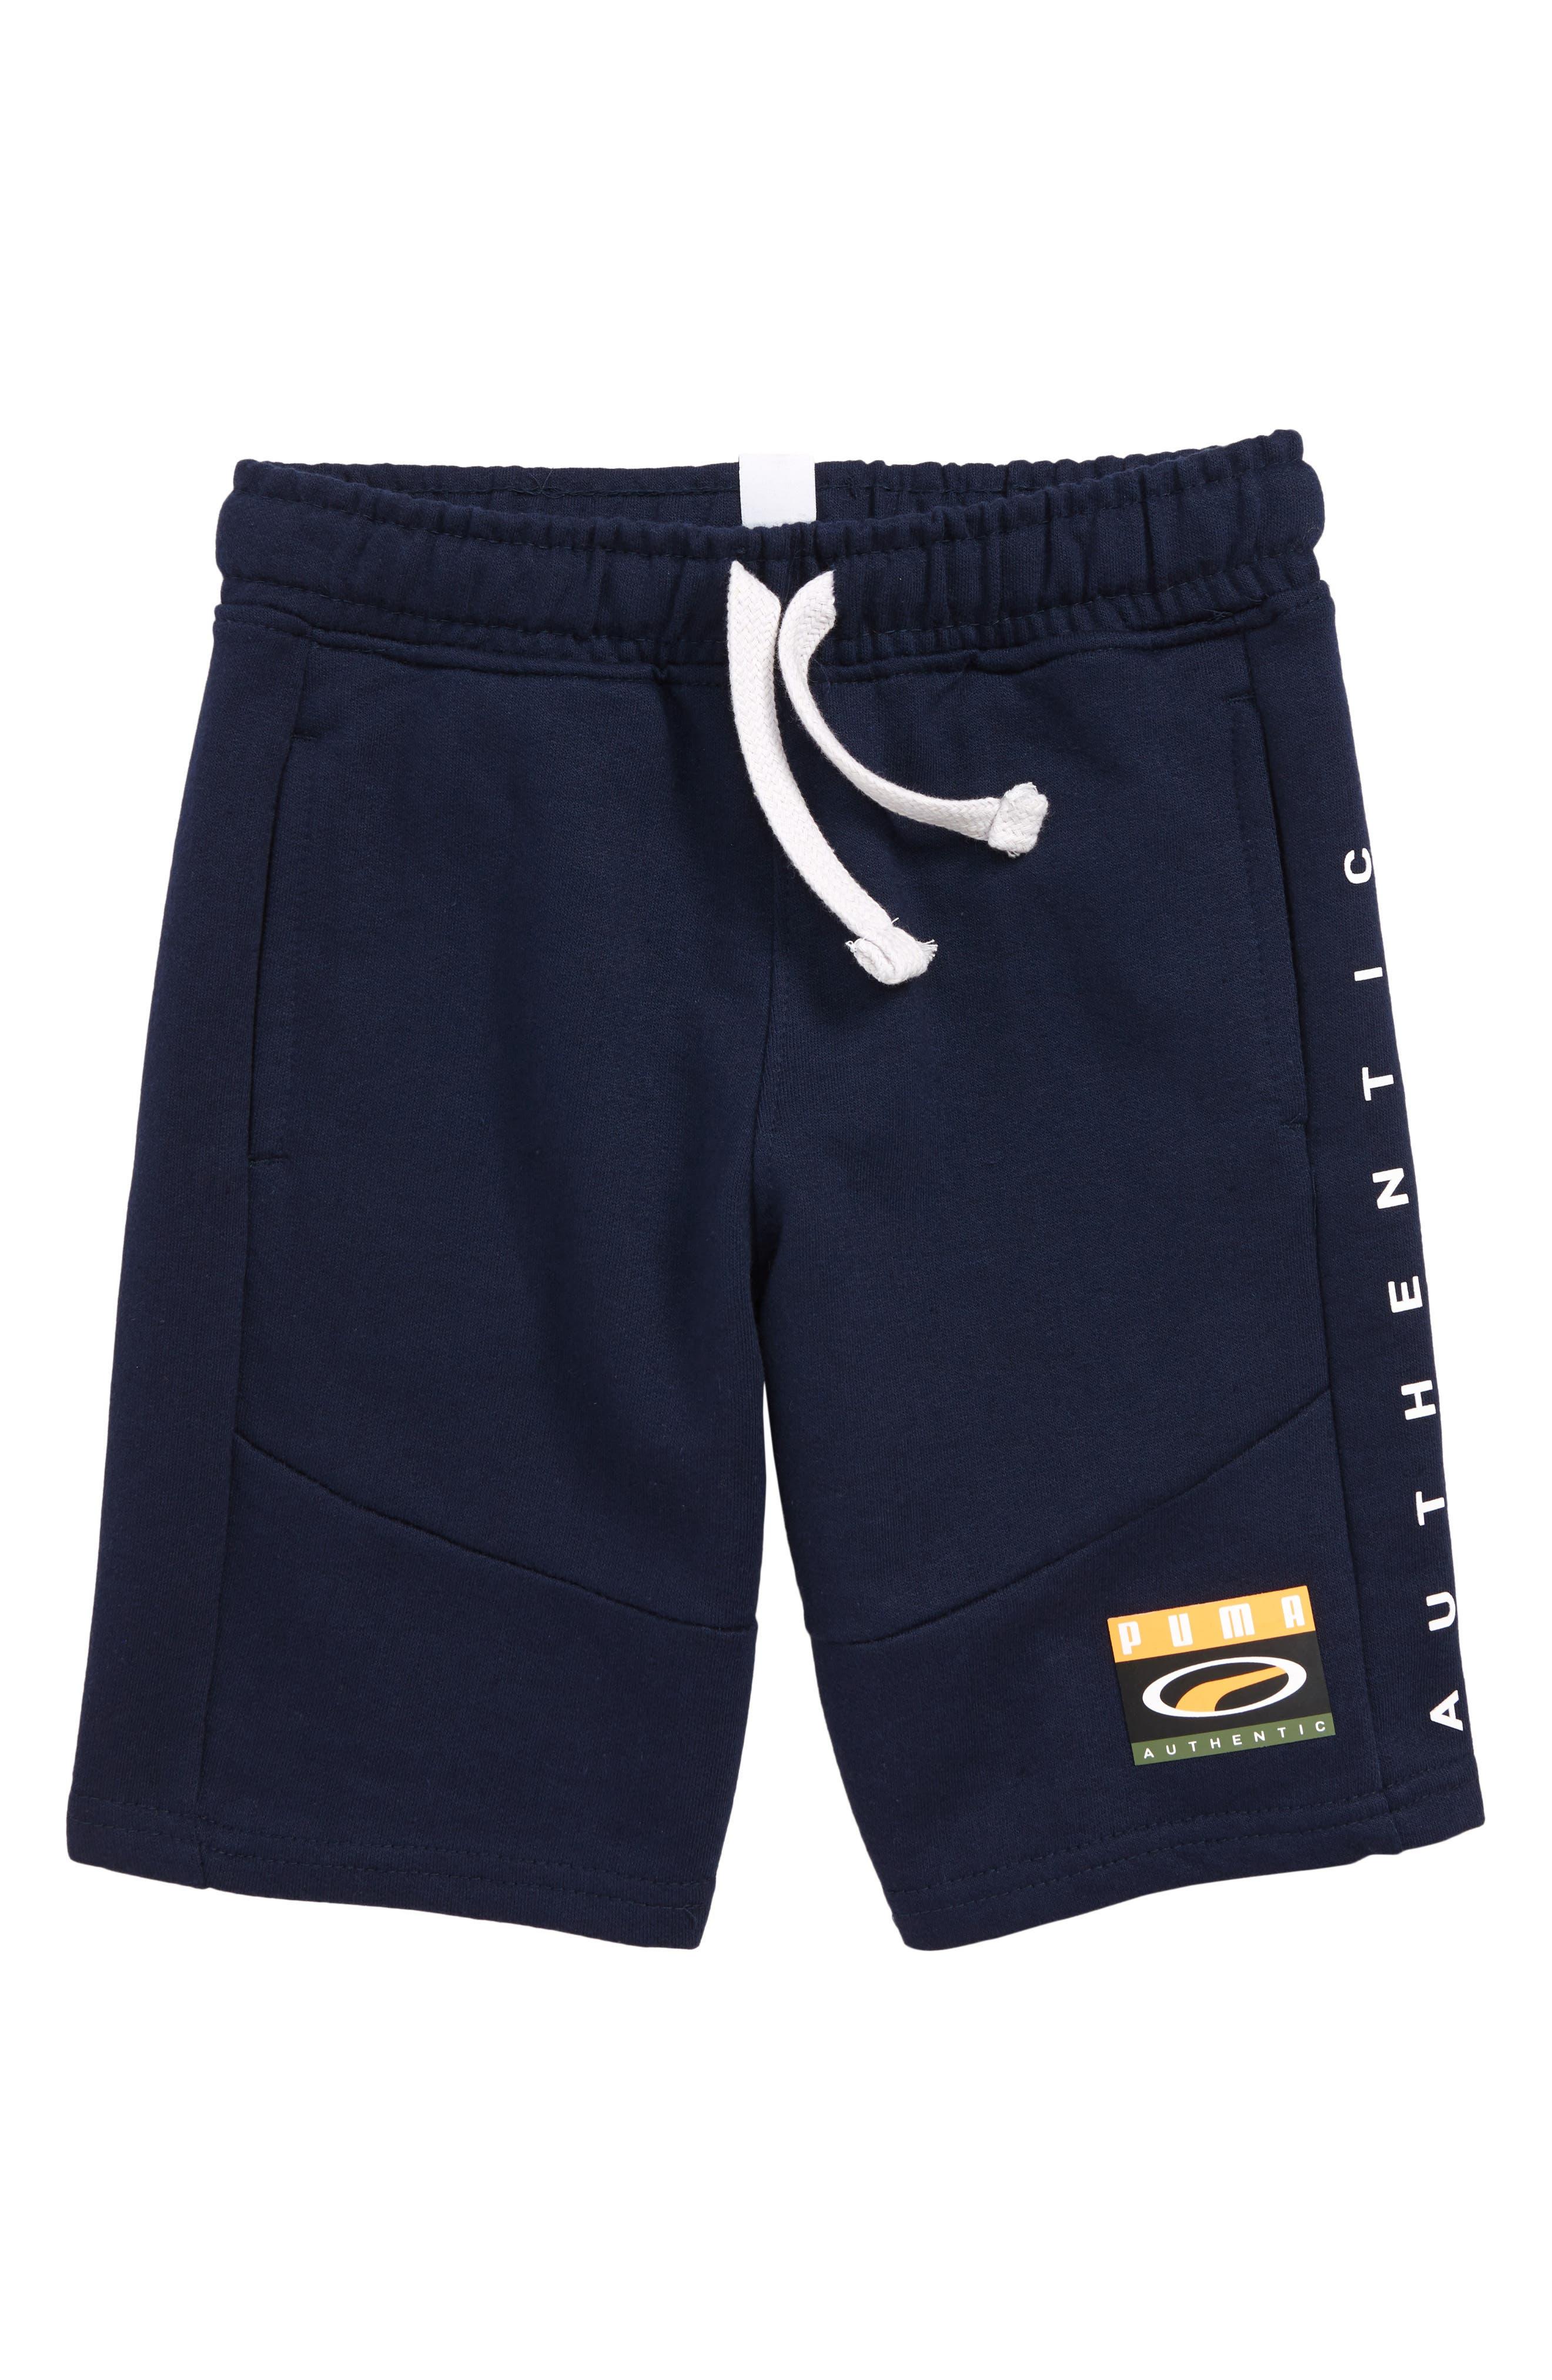 PUMA French Terry Shorts, Main, color, PEACOAT